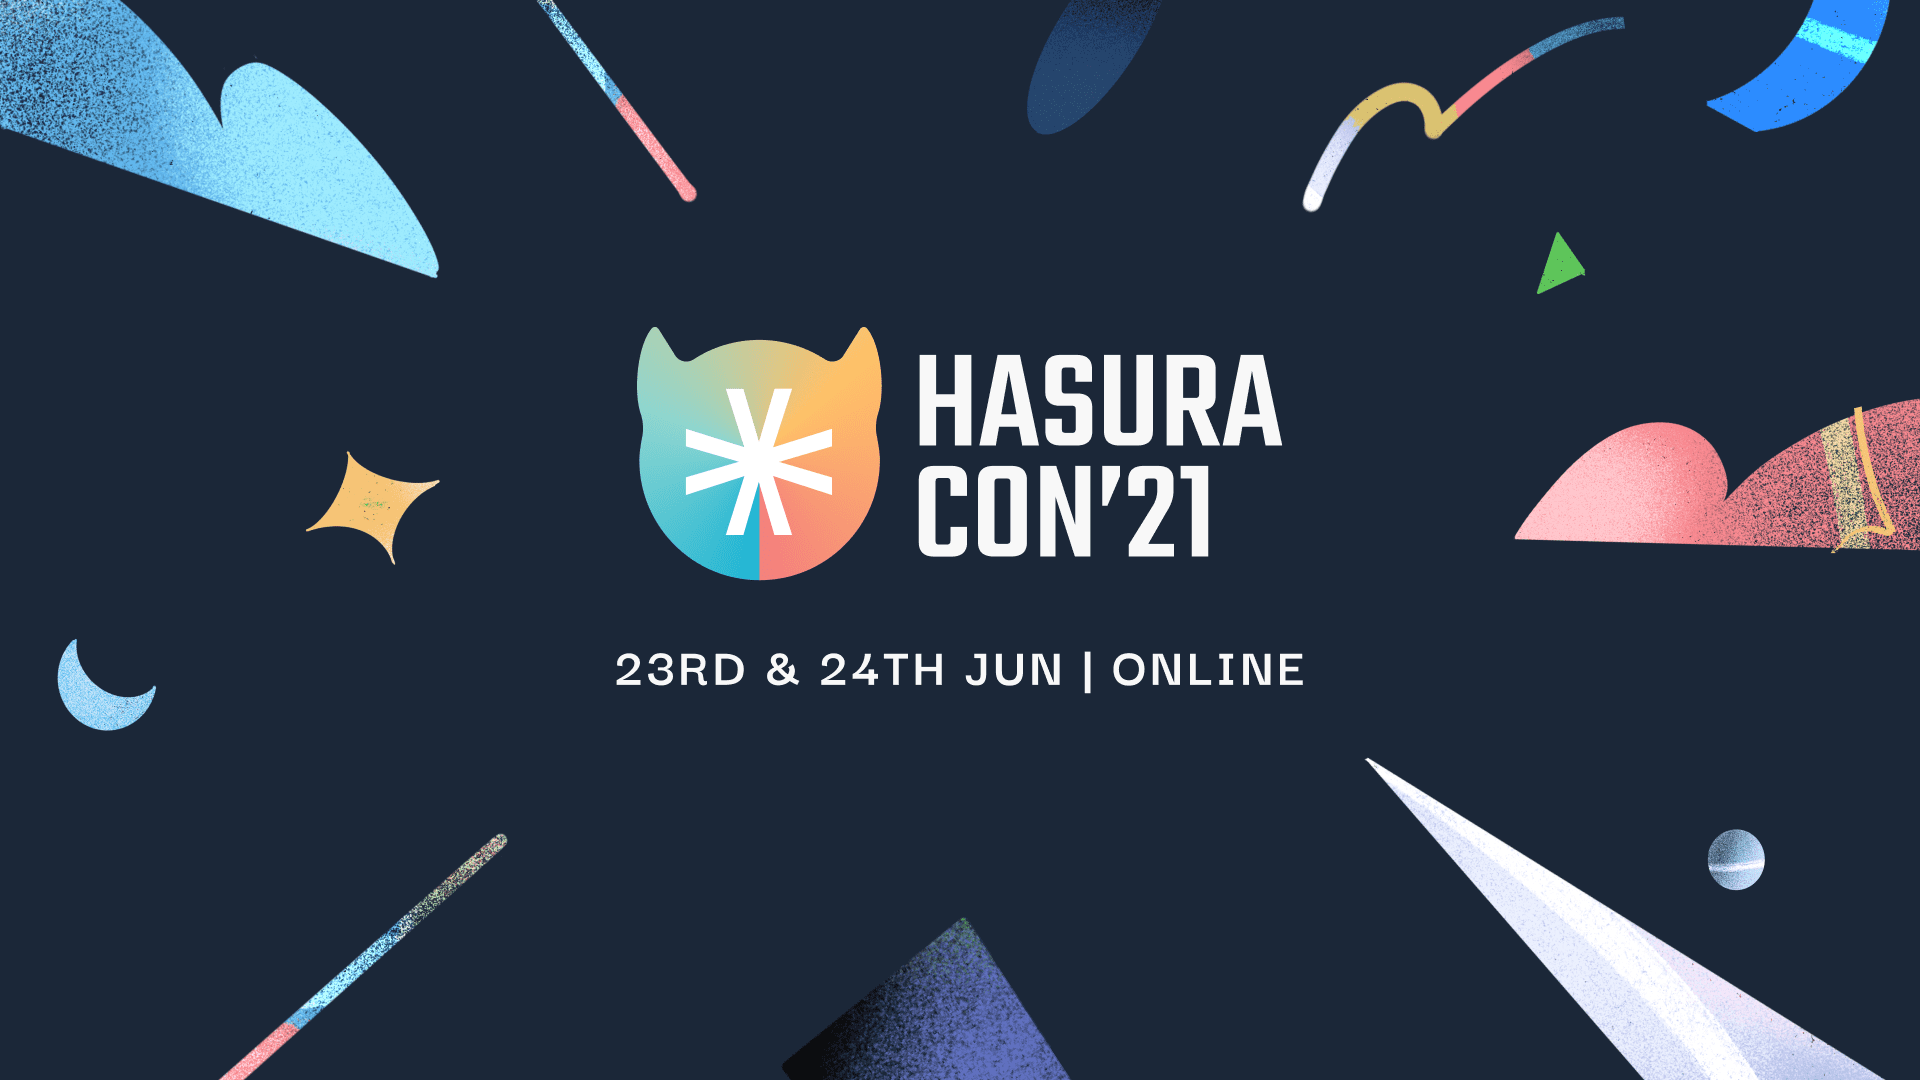 HasuraCon'21: Announcing the Hasura User Conference